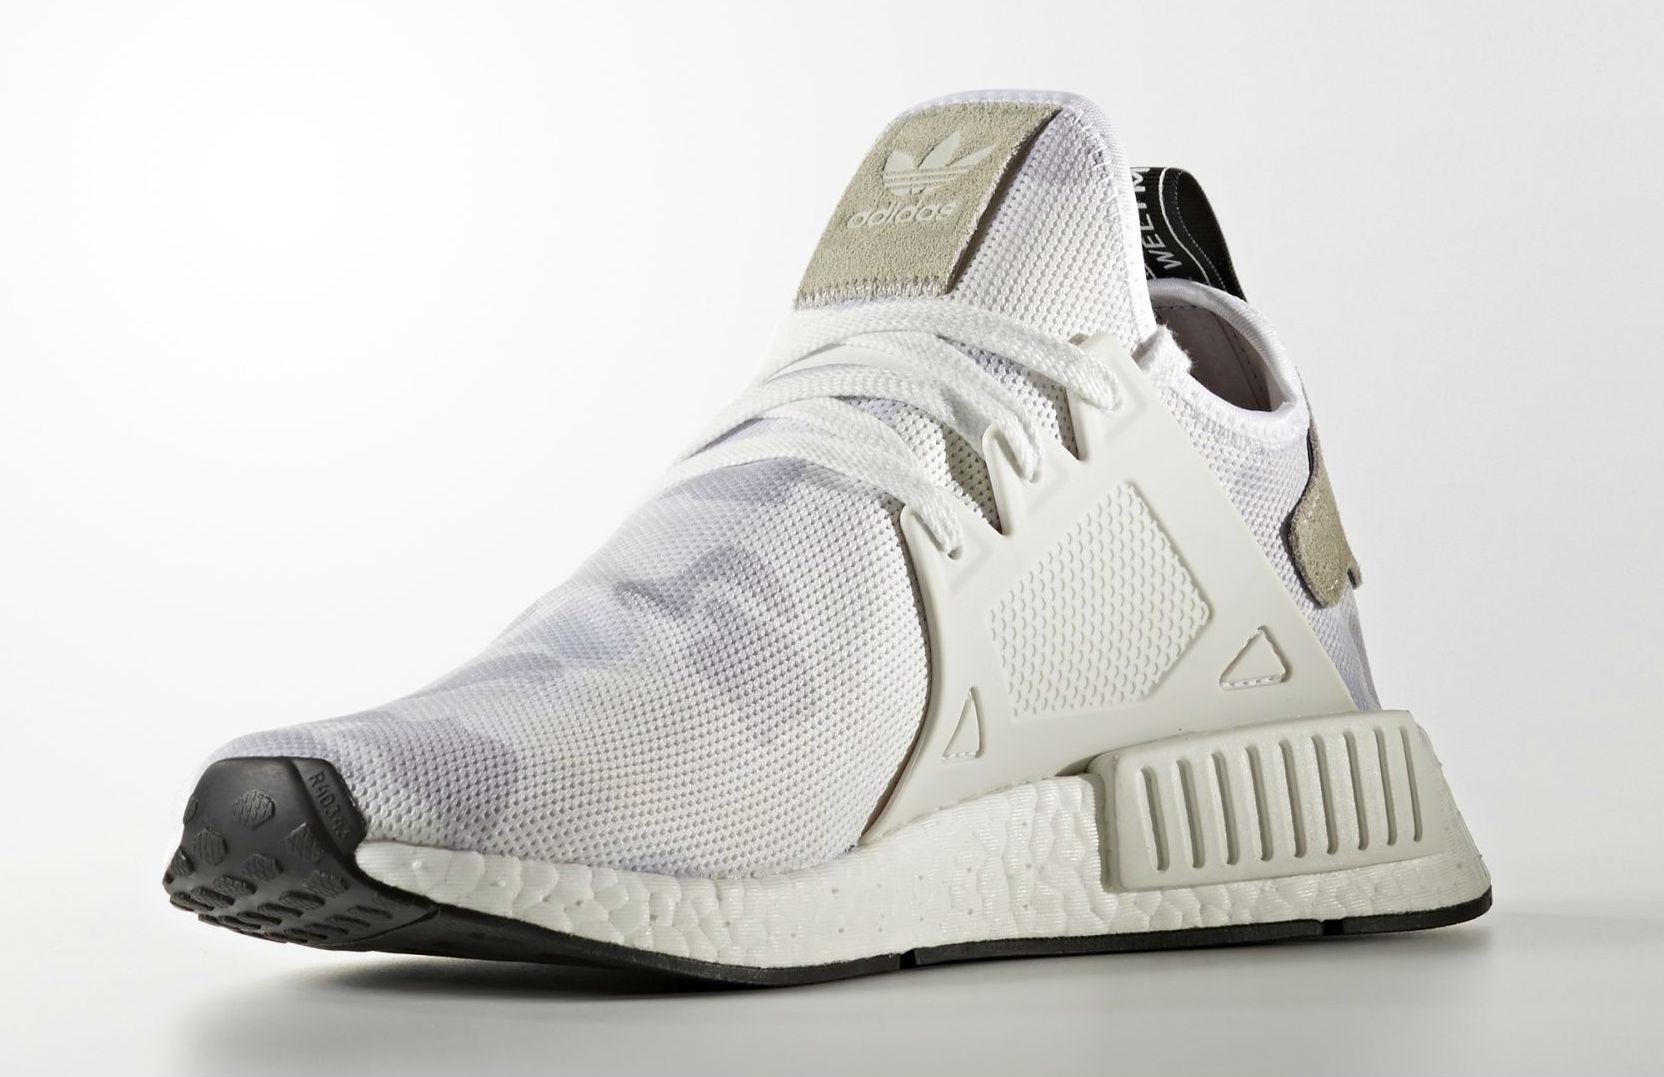 Adidas NMD XR1 White Camo